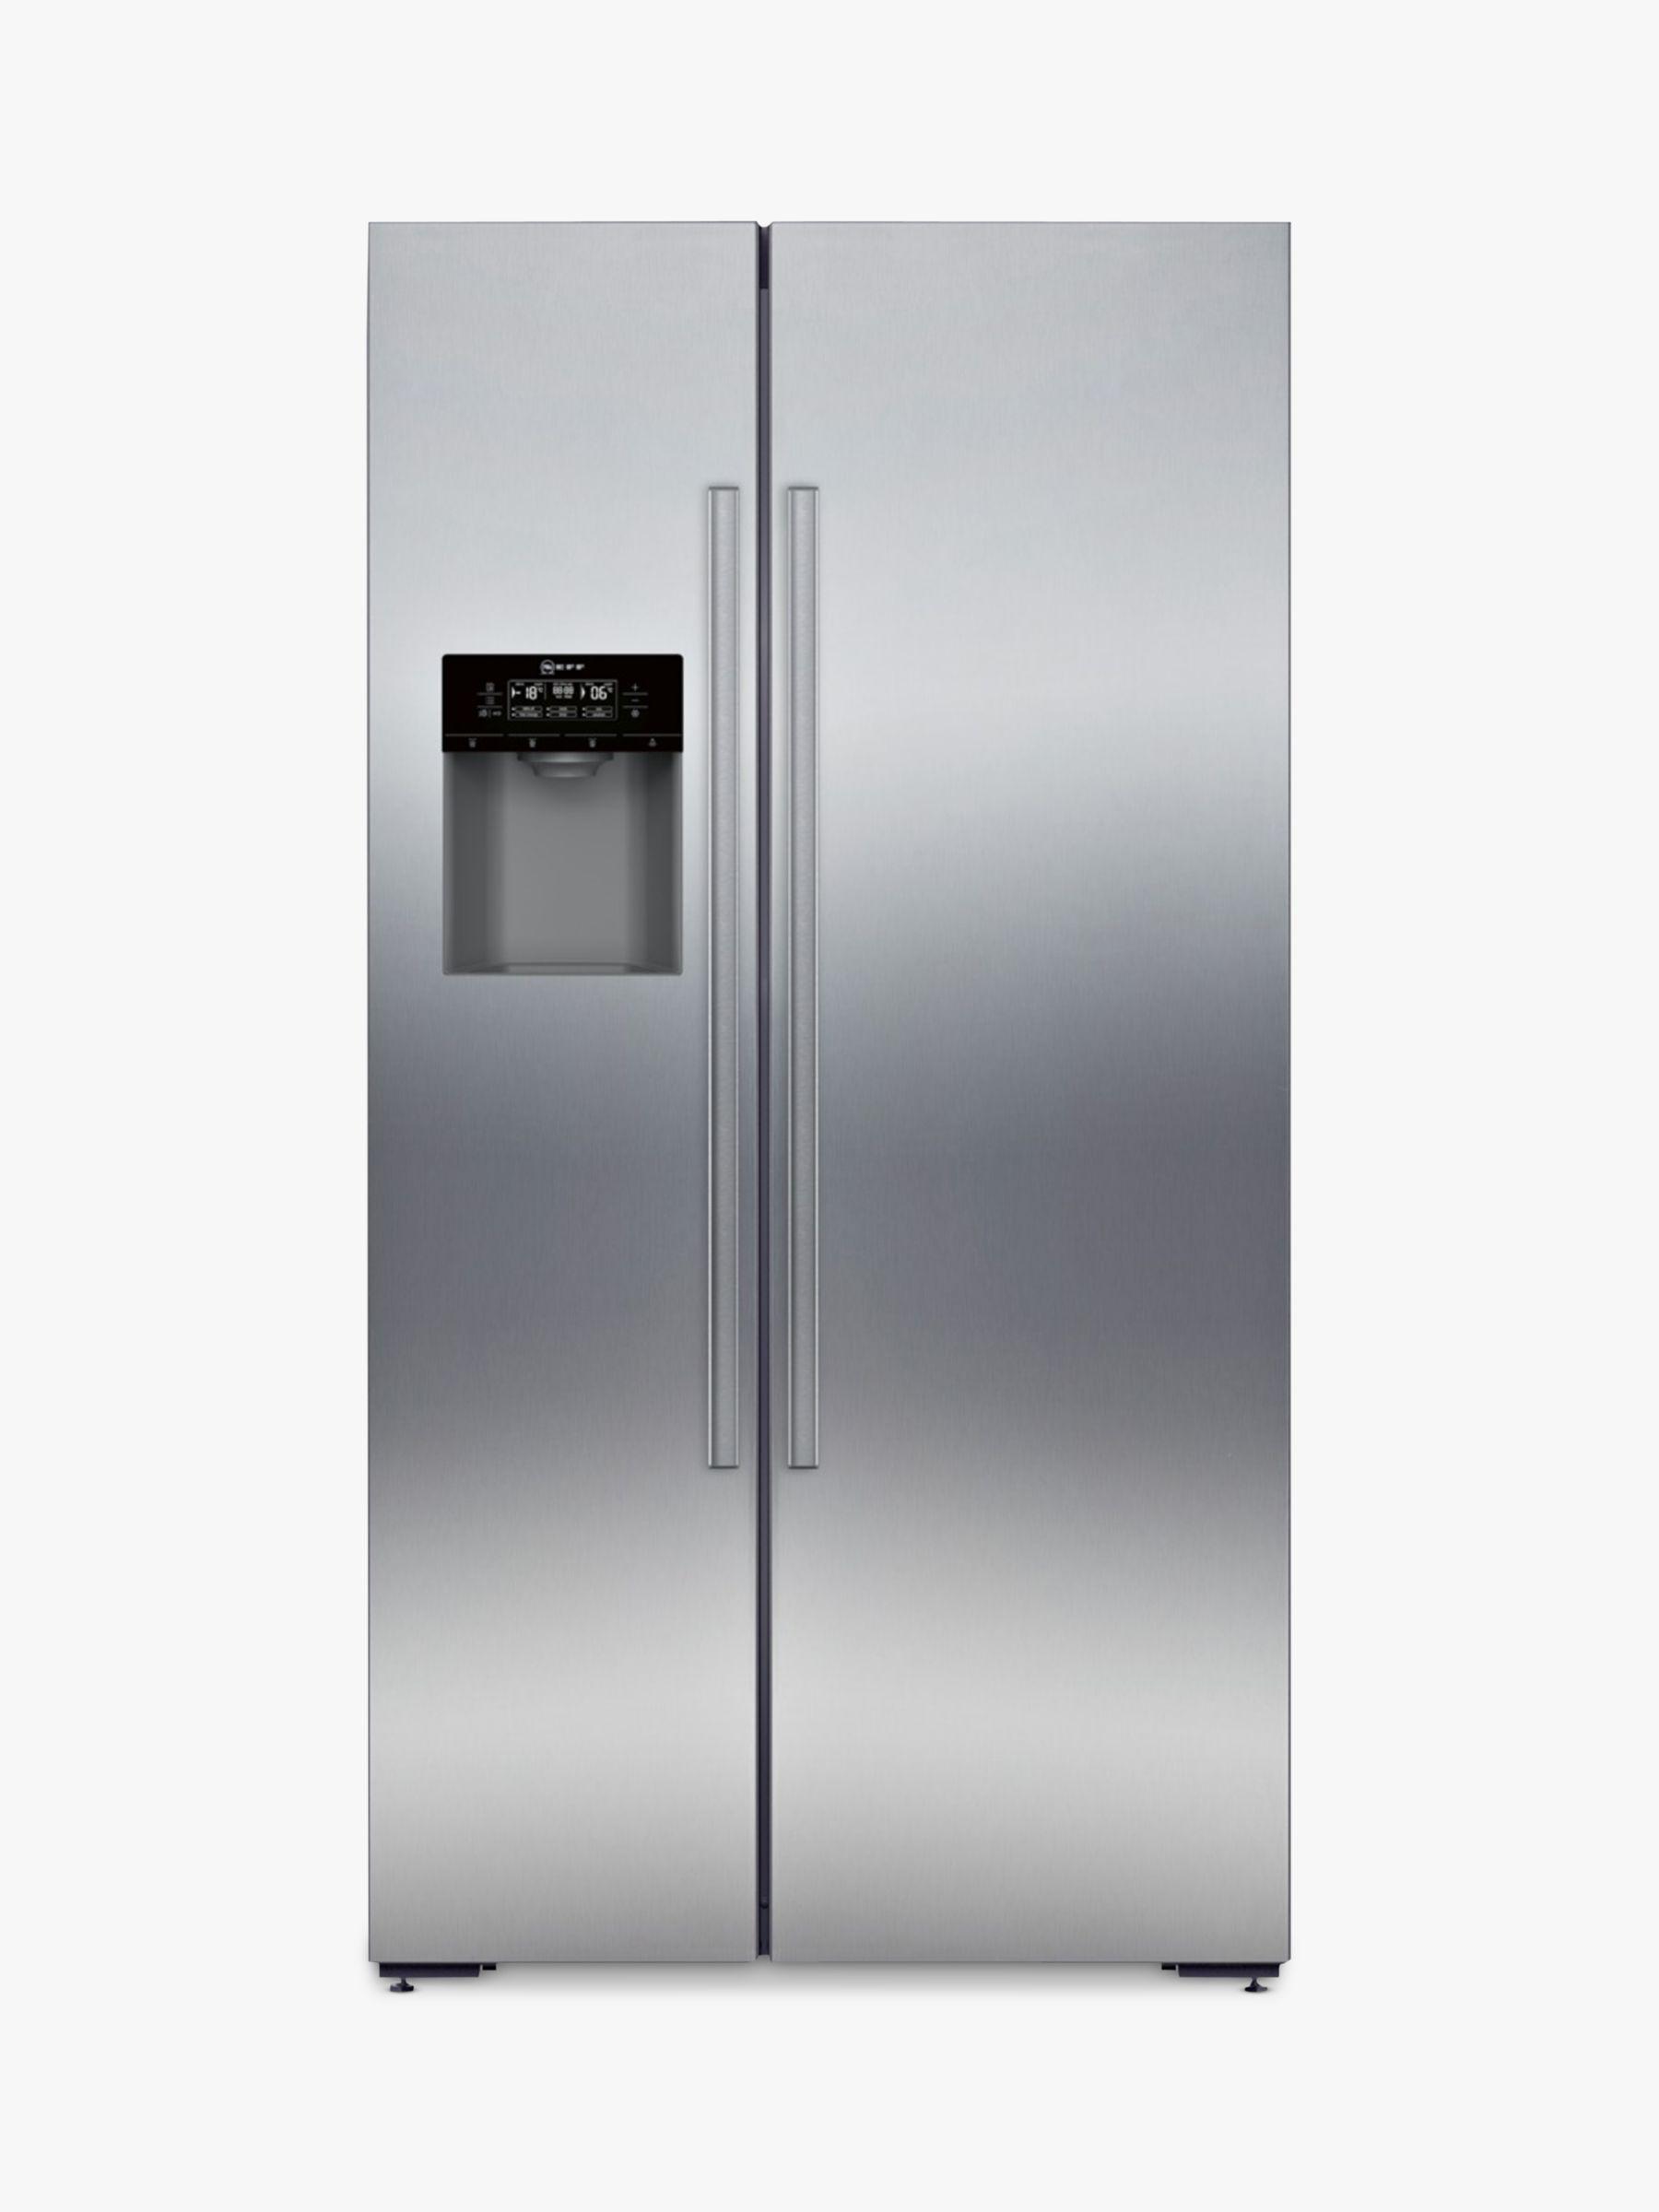 NEFF Neff KA3923I20G American Style Fridge Freezer, A+ Energy Rating, 90cm Wide, Stainless Steel